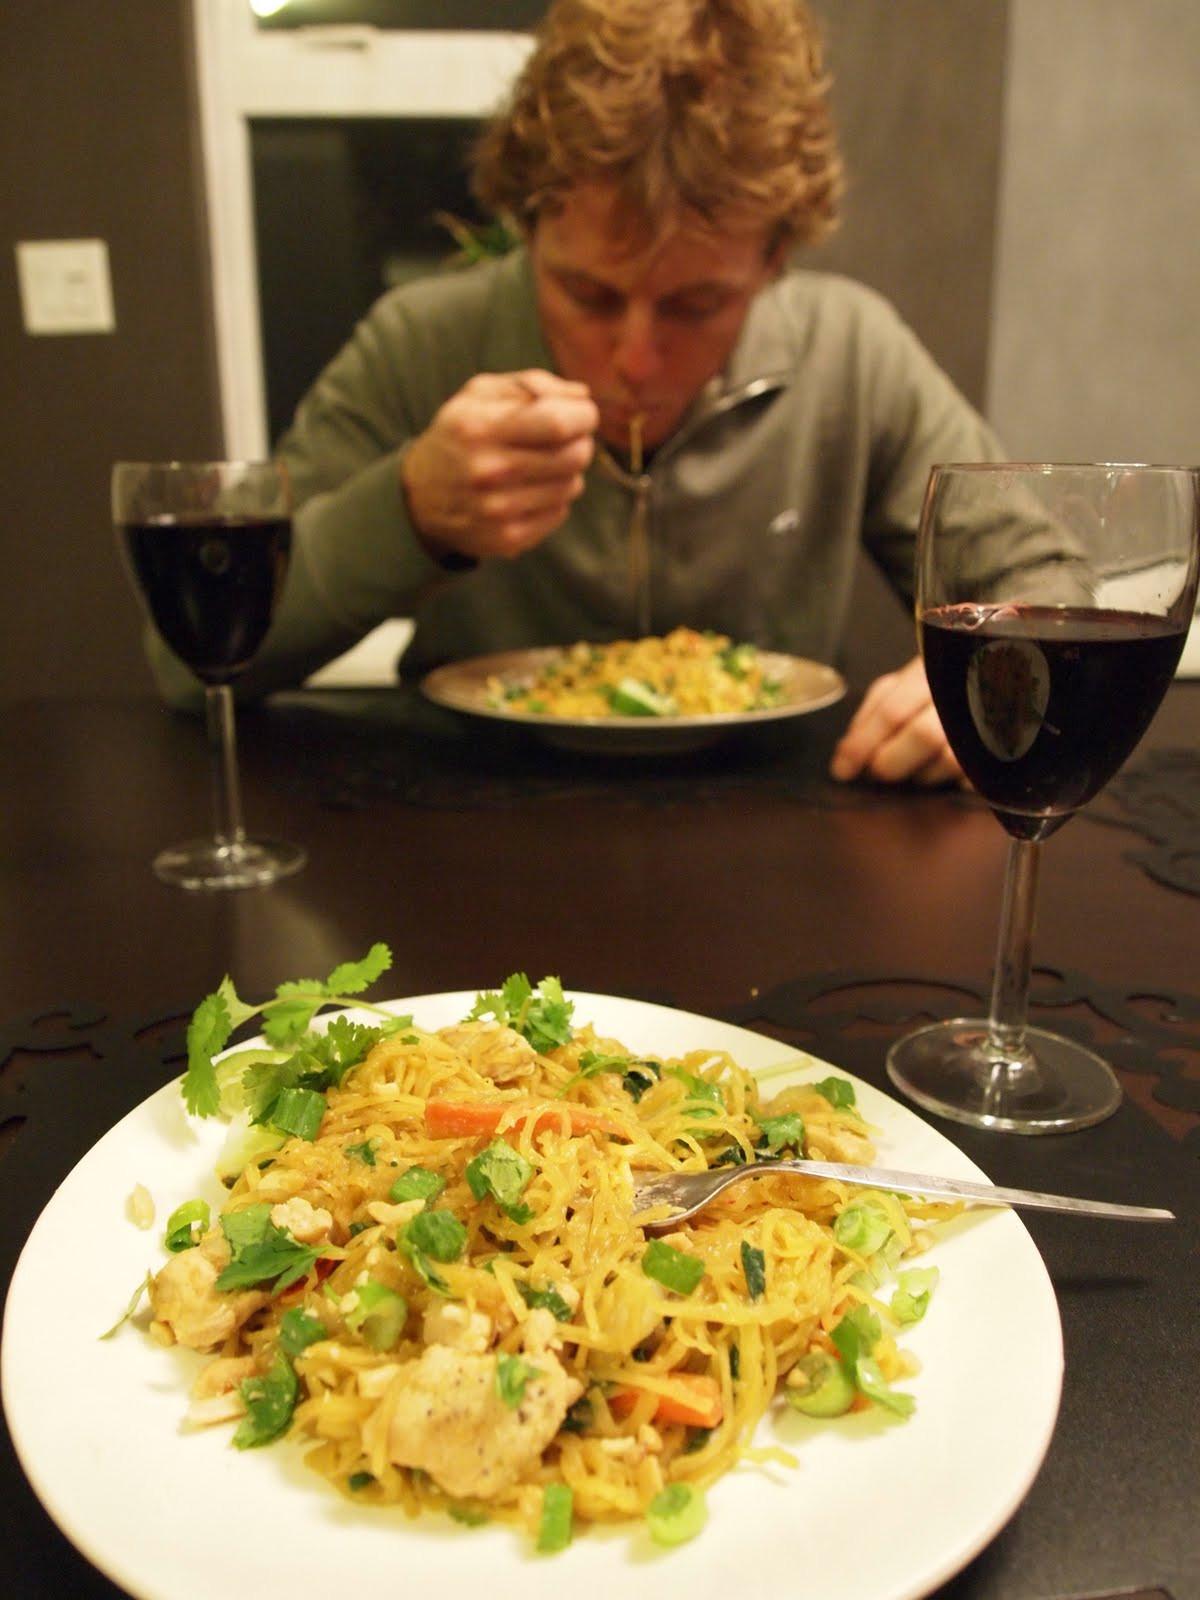 Spaghetti Squash Pad Thai  Stuff We Ate Chicken Pad Thai made with Spaghetti Squash